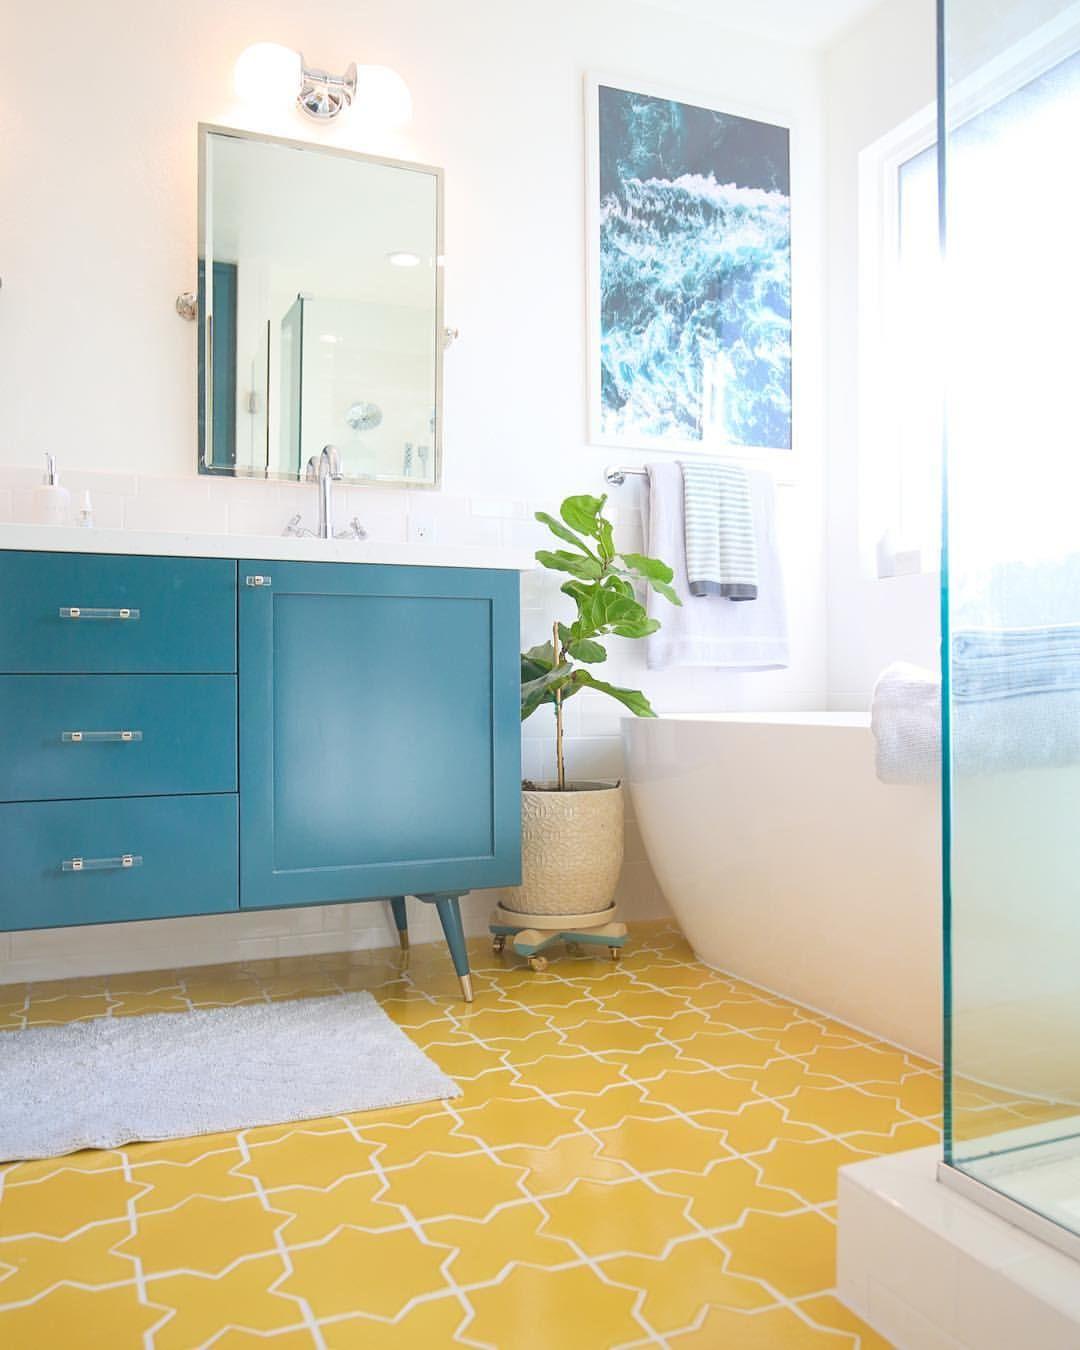 Teal Bathroom Vanity And Yellow Tile Floor Teal Bathroom Bathrooms Remodel Bright Bathroom